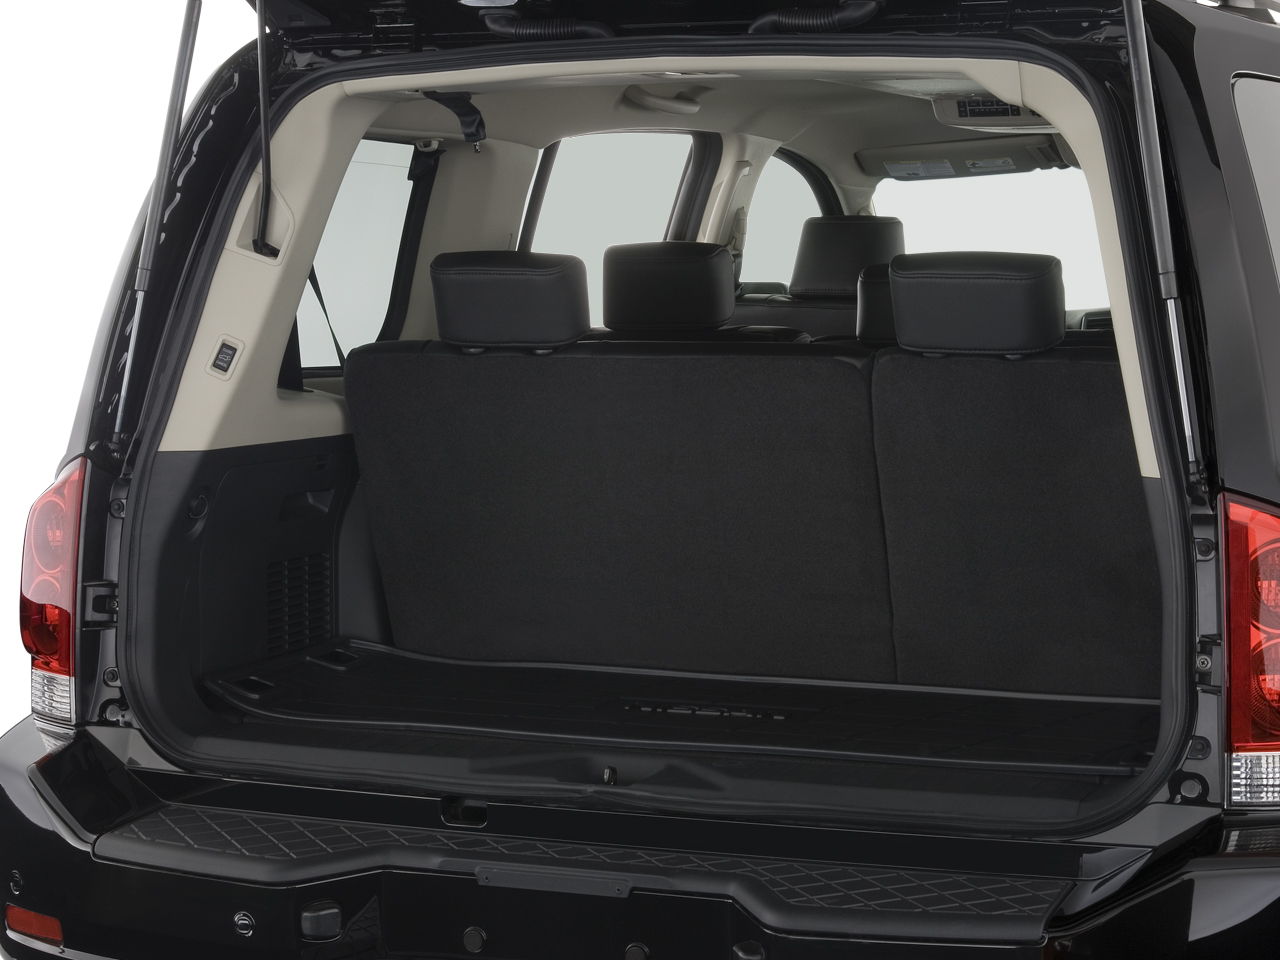 Nissan Armada 2020 >> 2009 Nissan Armada LE 4x4 - Nissan Full-Size SUV Review - Automobile Magazine